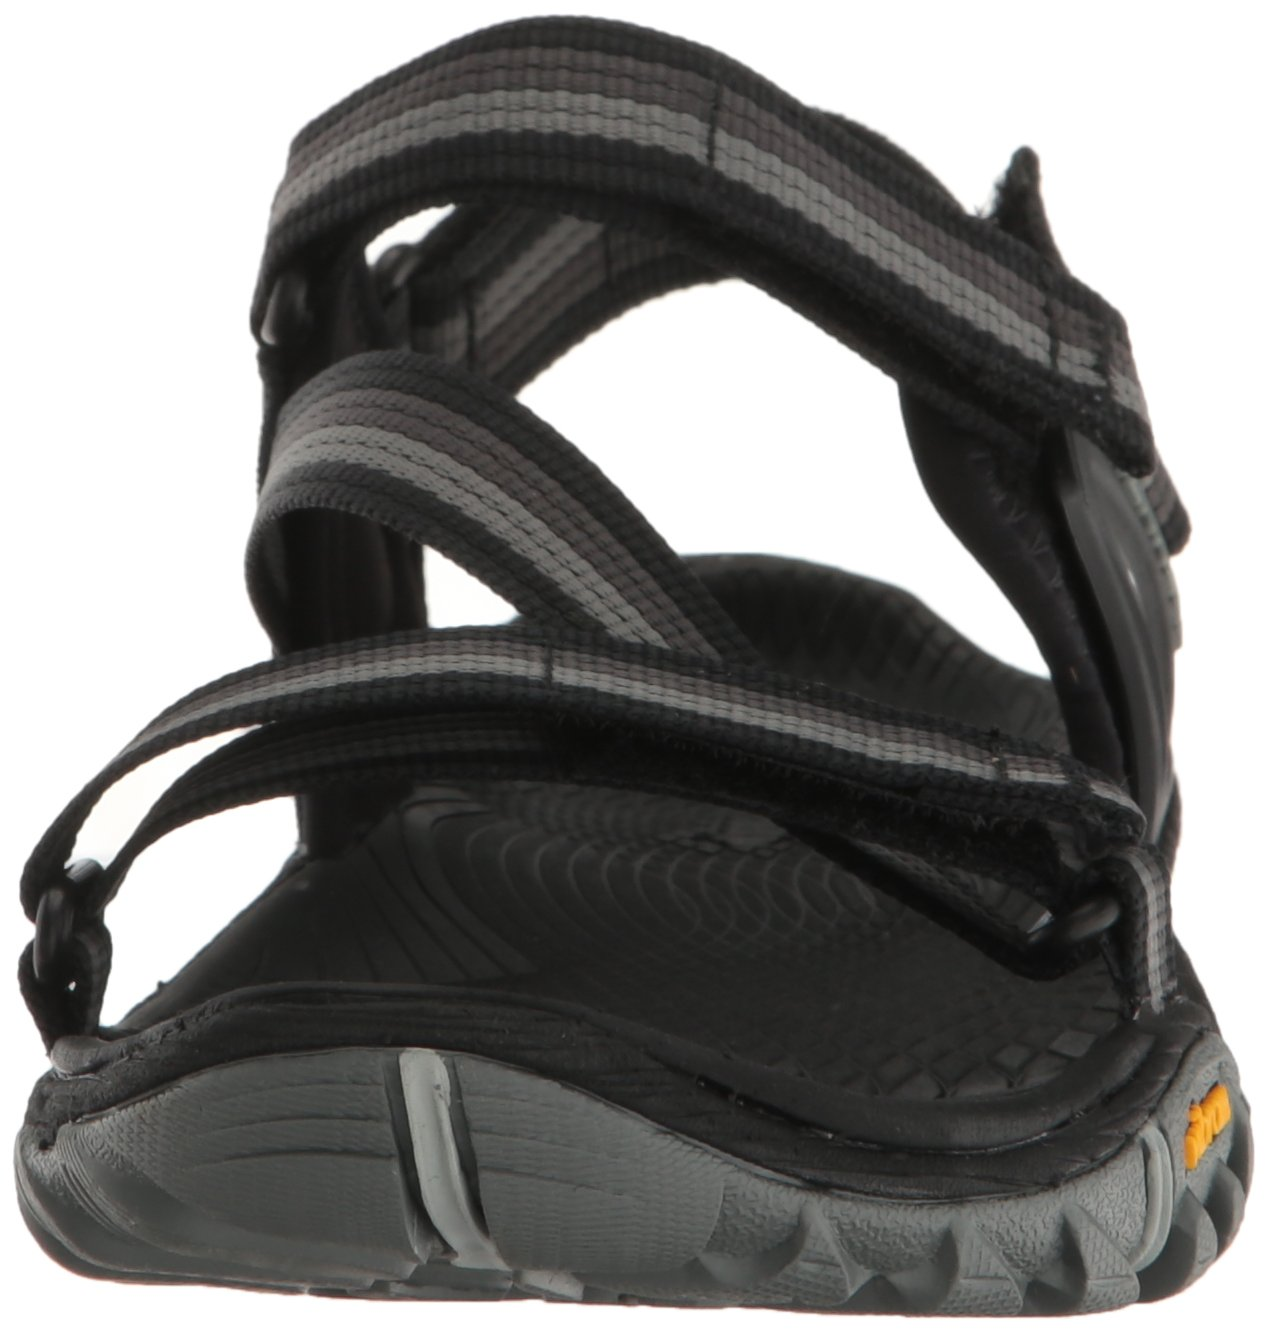 Merrell Women's All Out Blaze Web Sandal, Black, 9 M US by Merrell (Image #4)